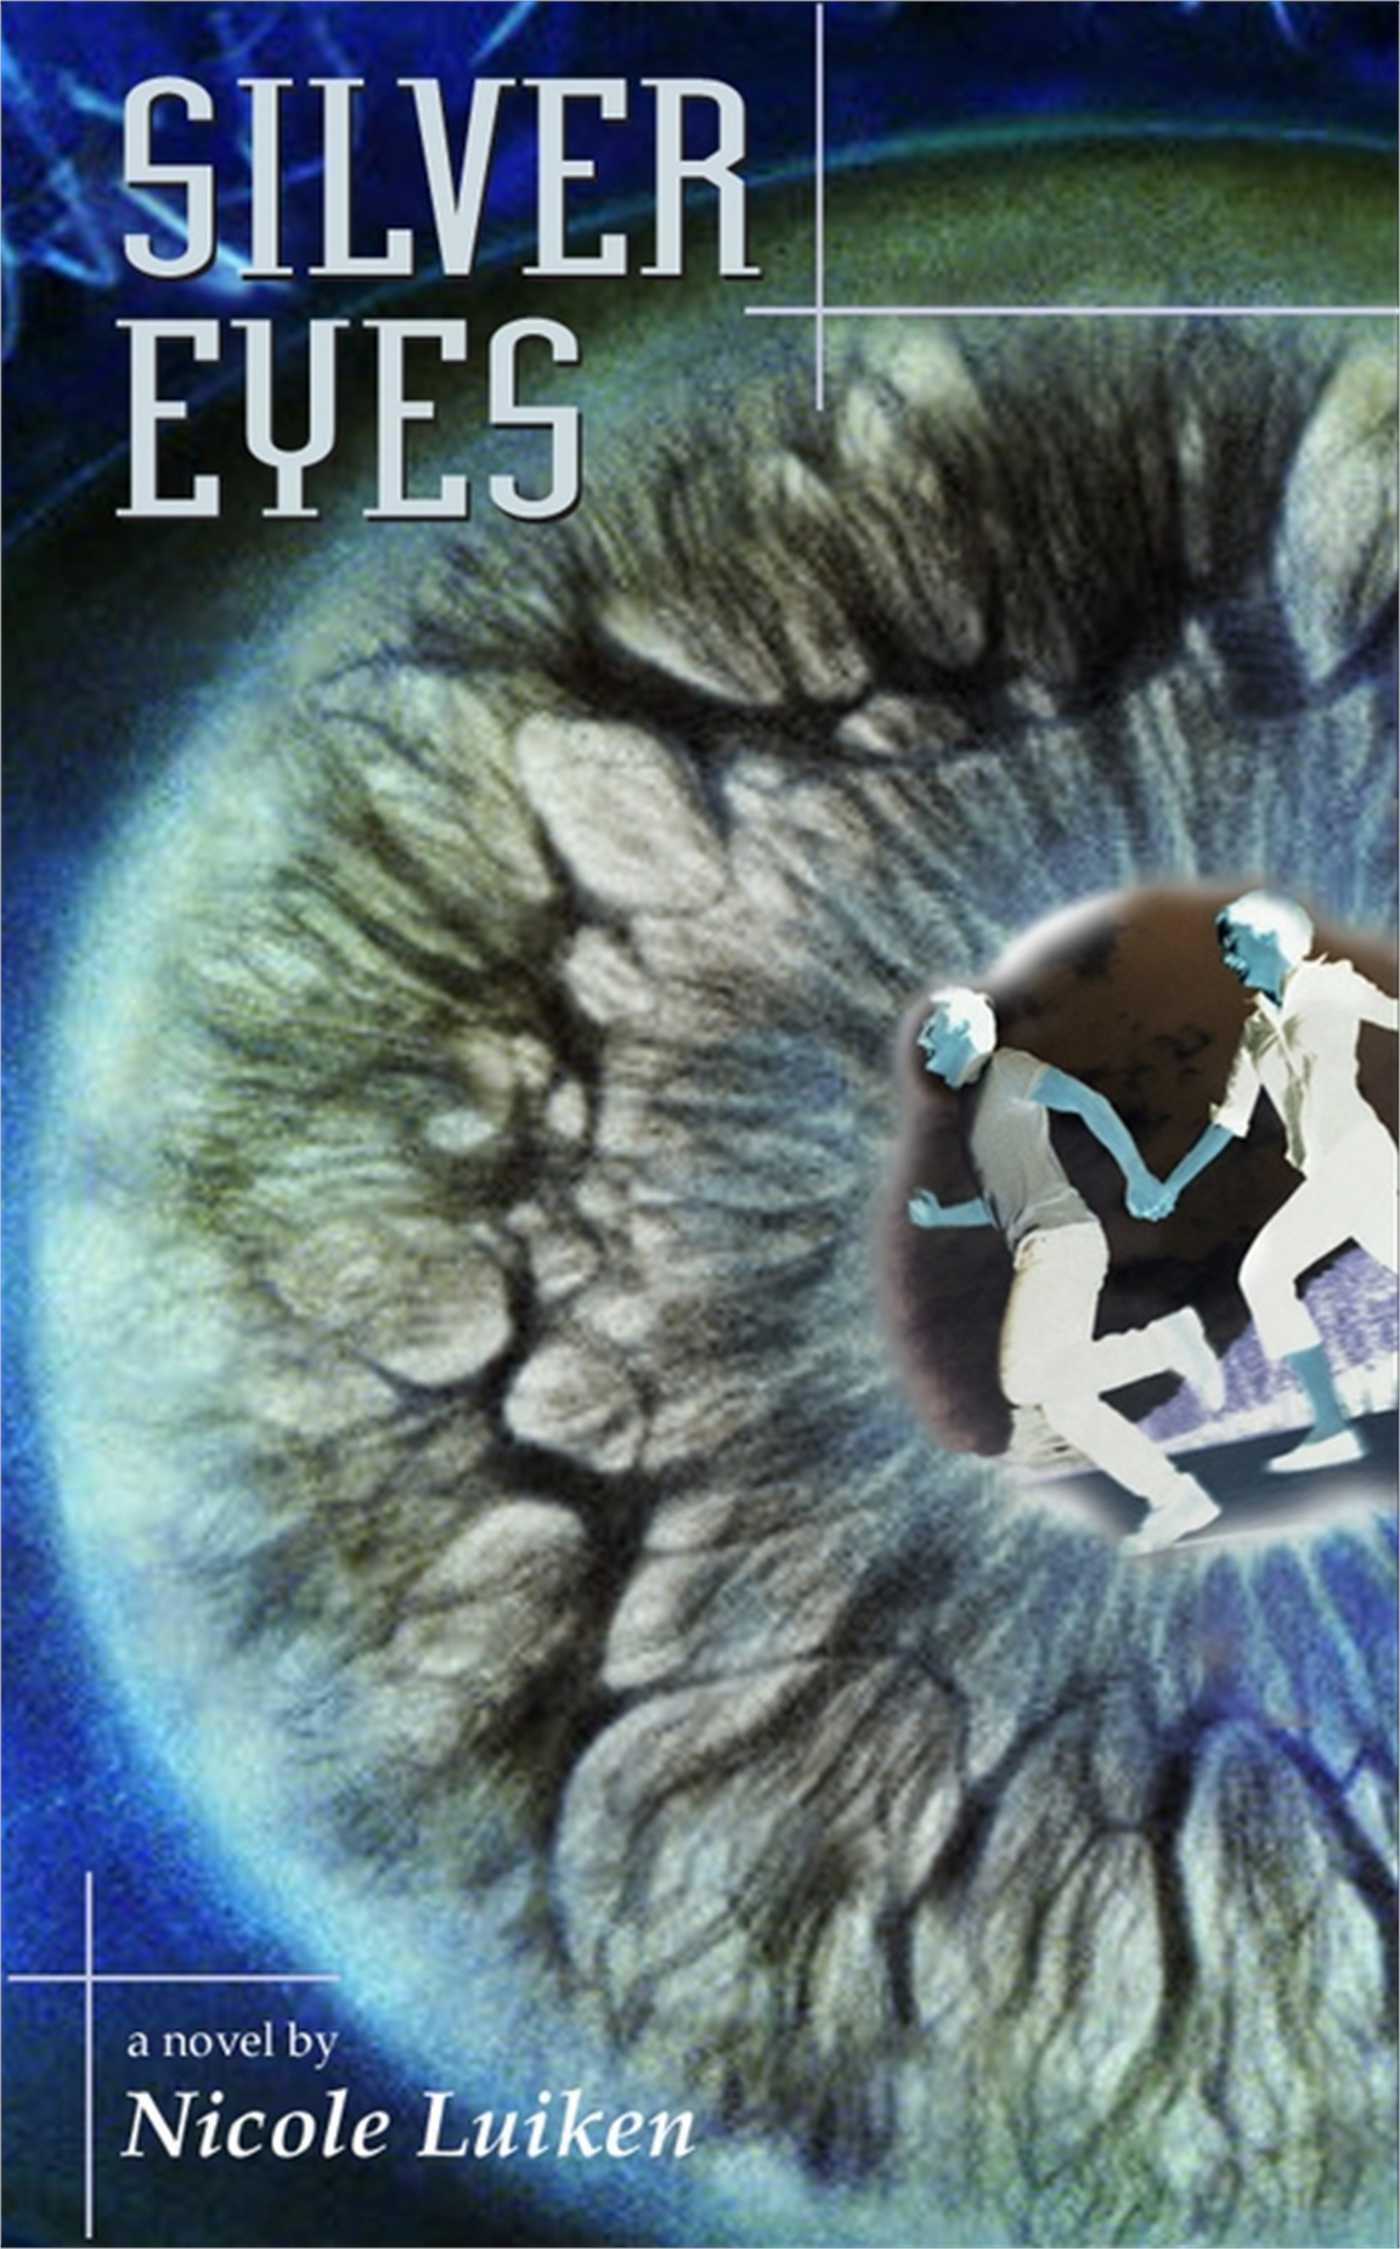 Silver eyes 9780743434225 hr